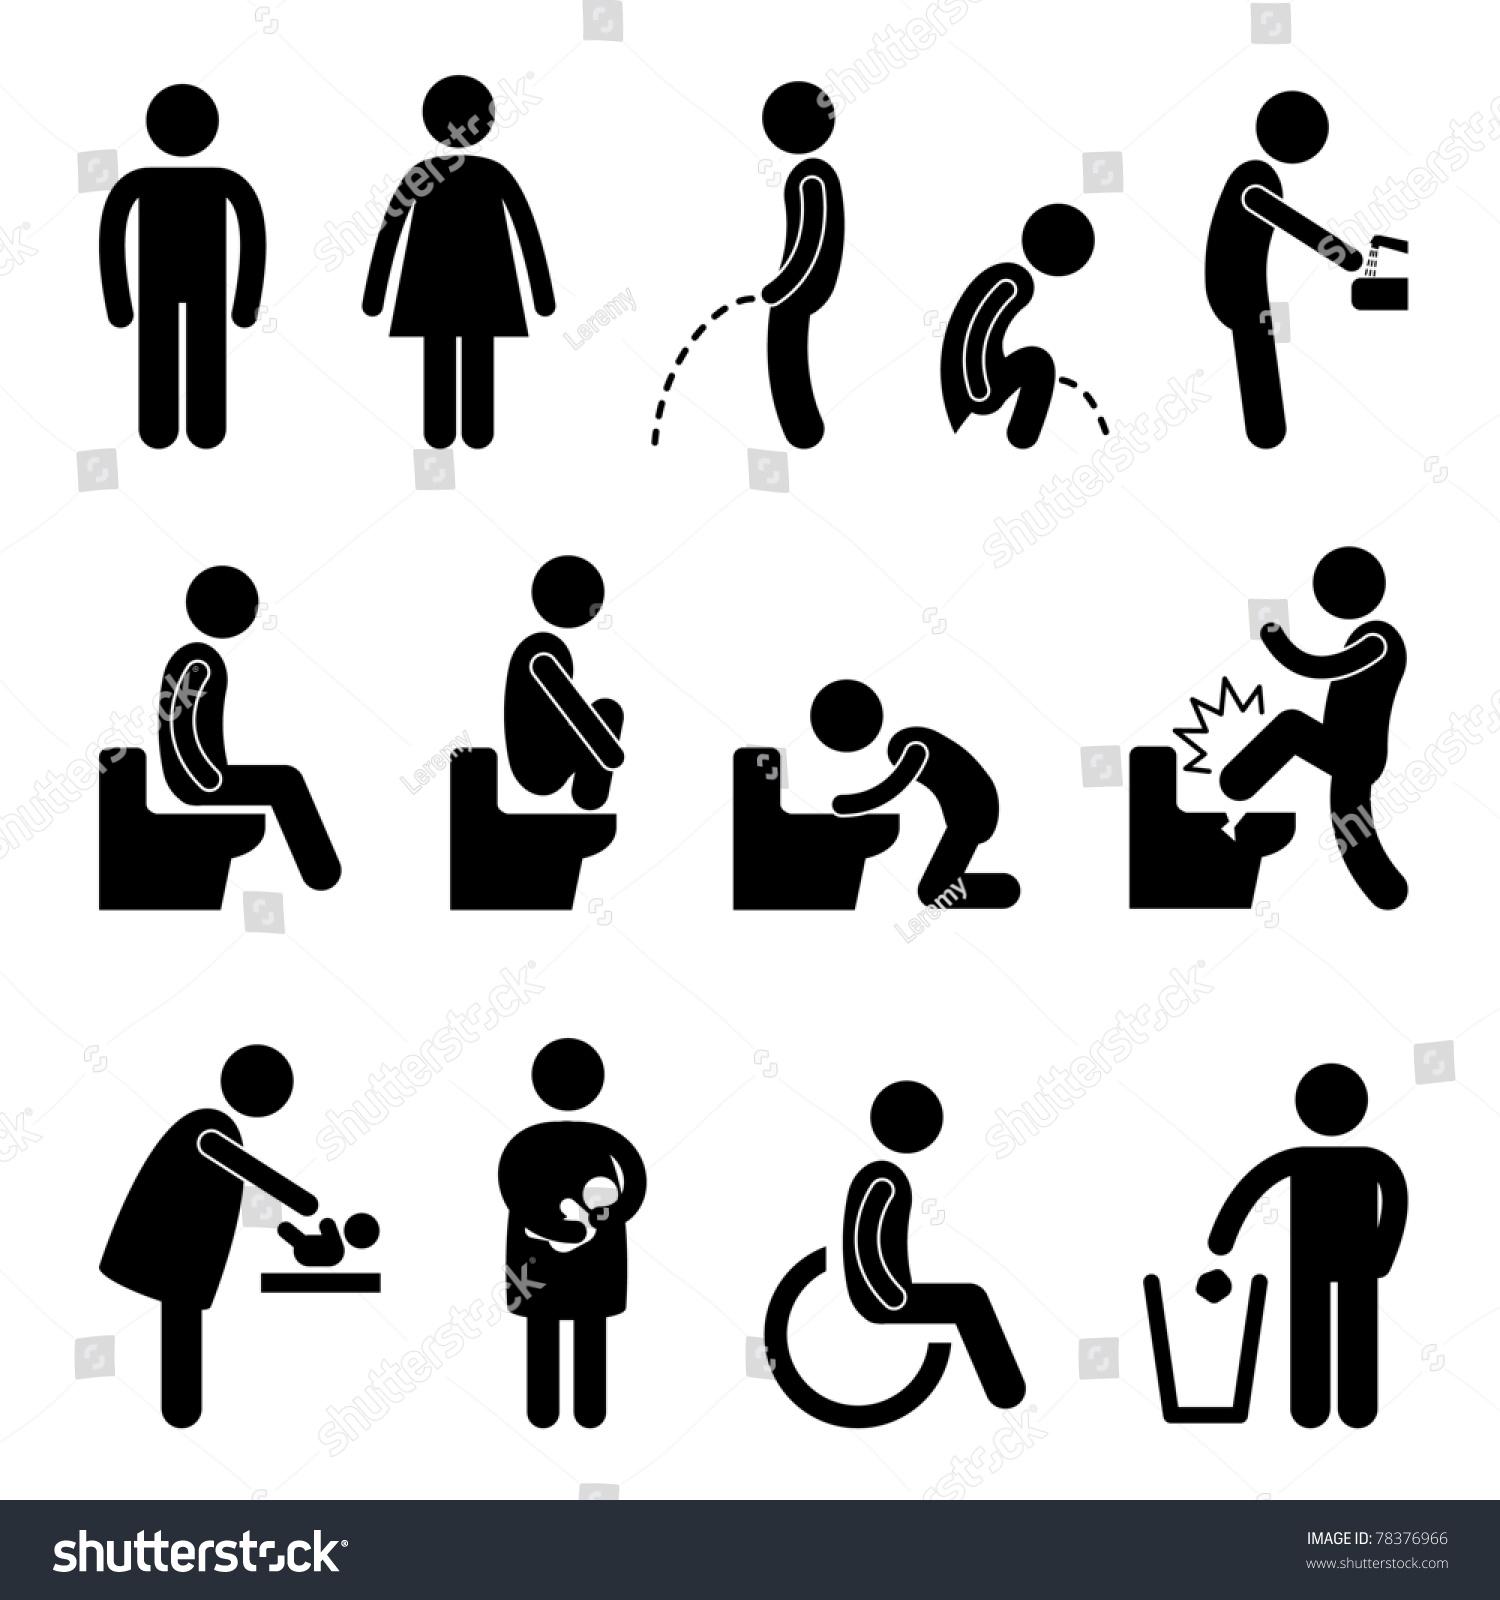 toilet bathroom male female pregnant handicap public sign symbol icon